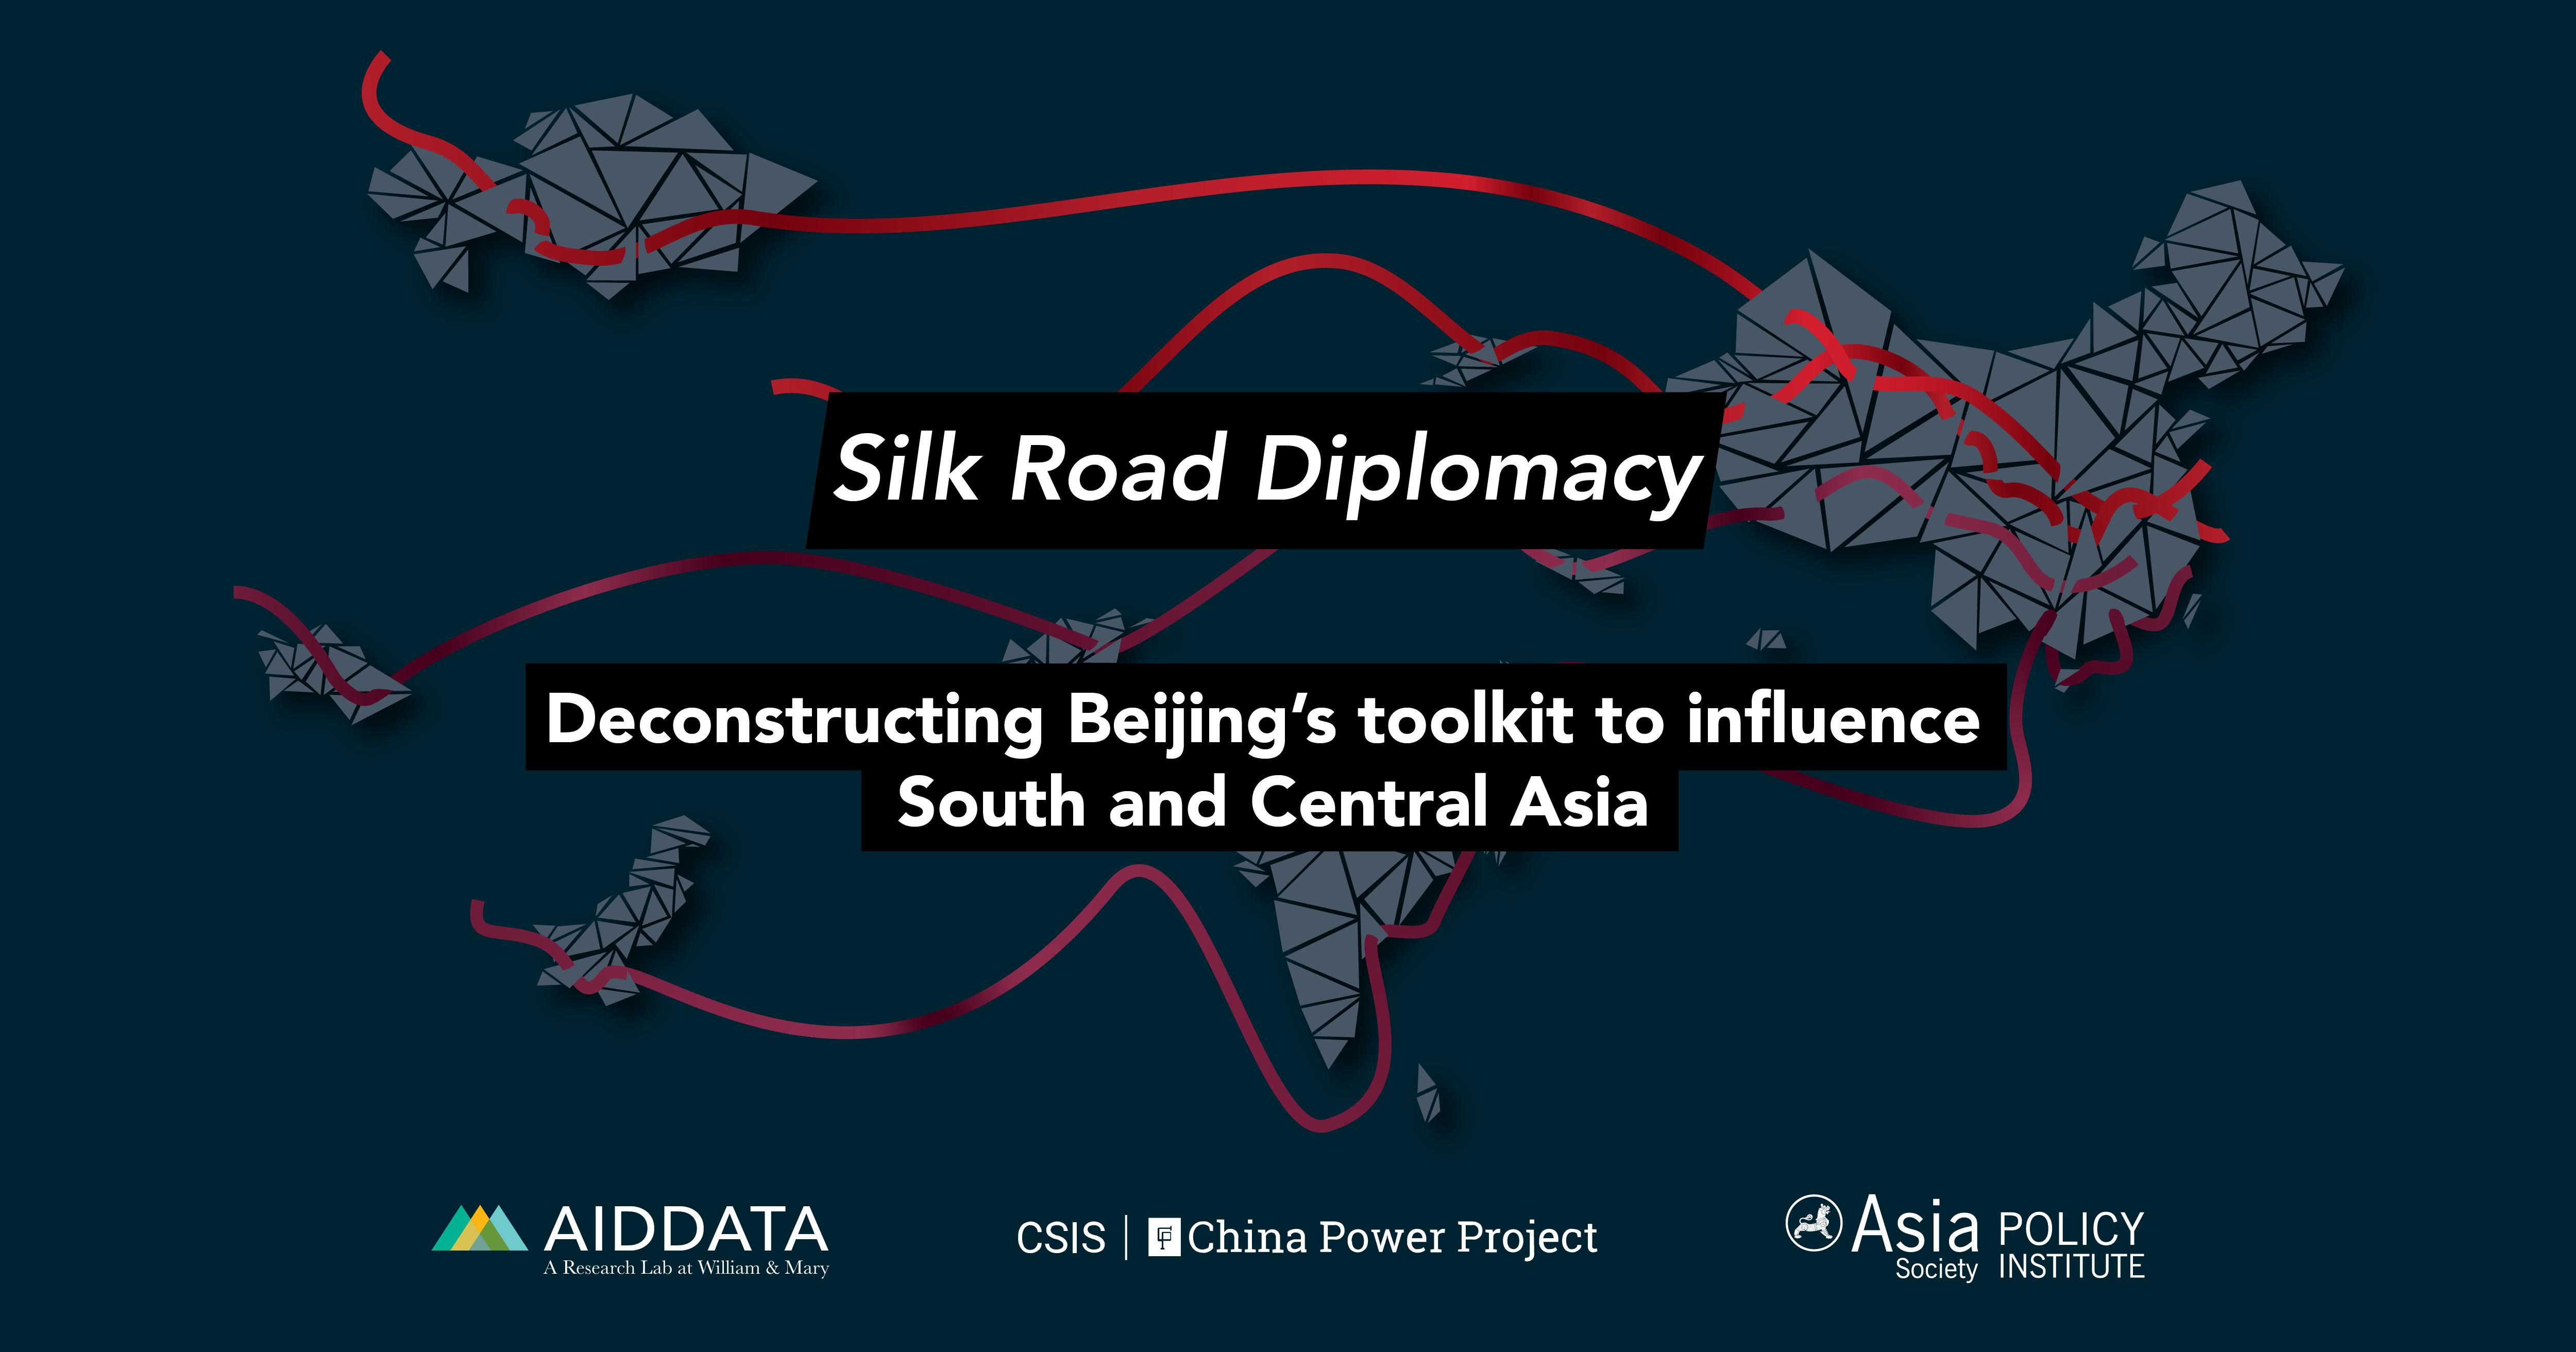 cover art of the report, Silk Road Diplomacy